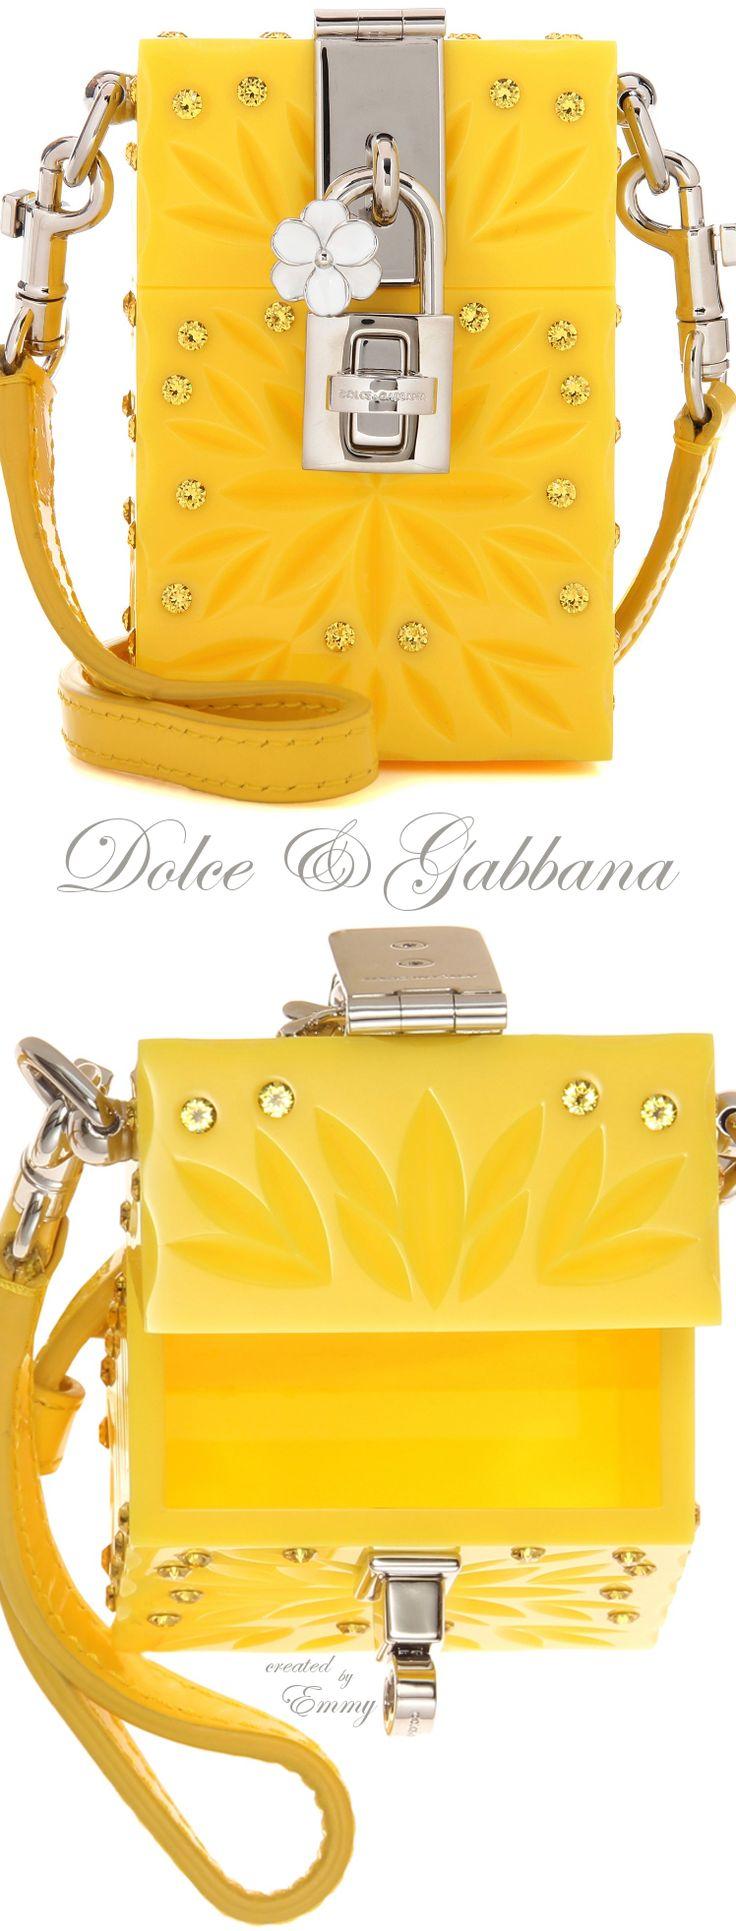 Emmy DE * Dolce & Gabbana Dolce Box Cinderella Mini shoulder bag